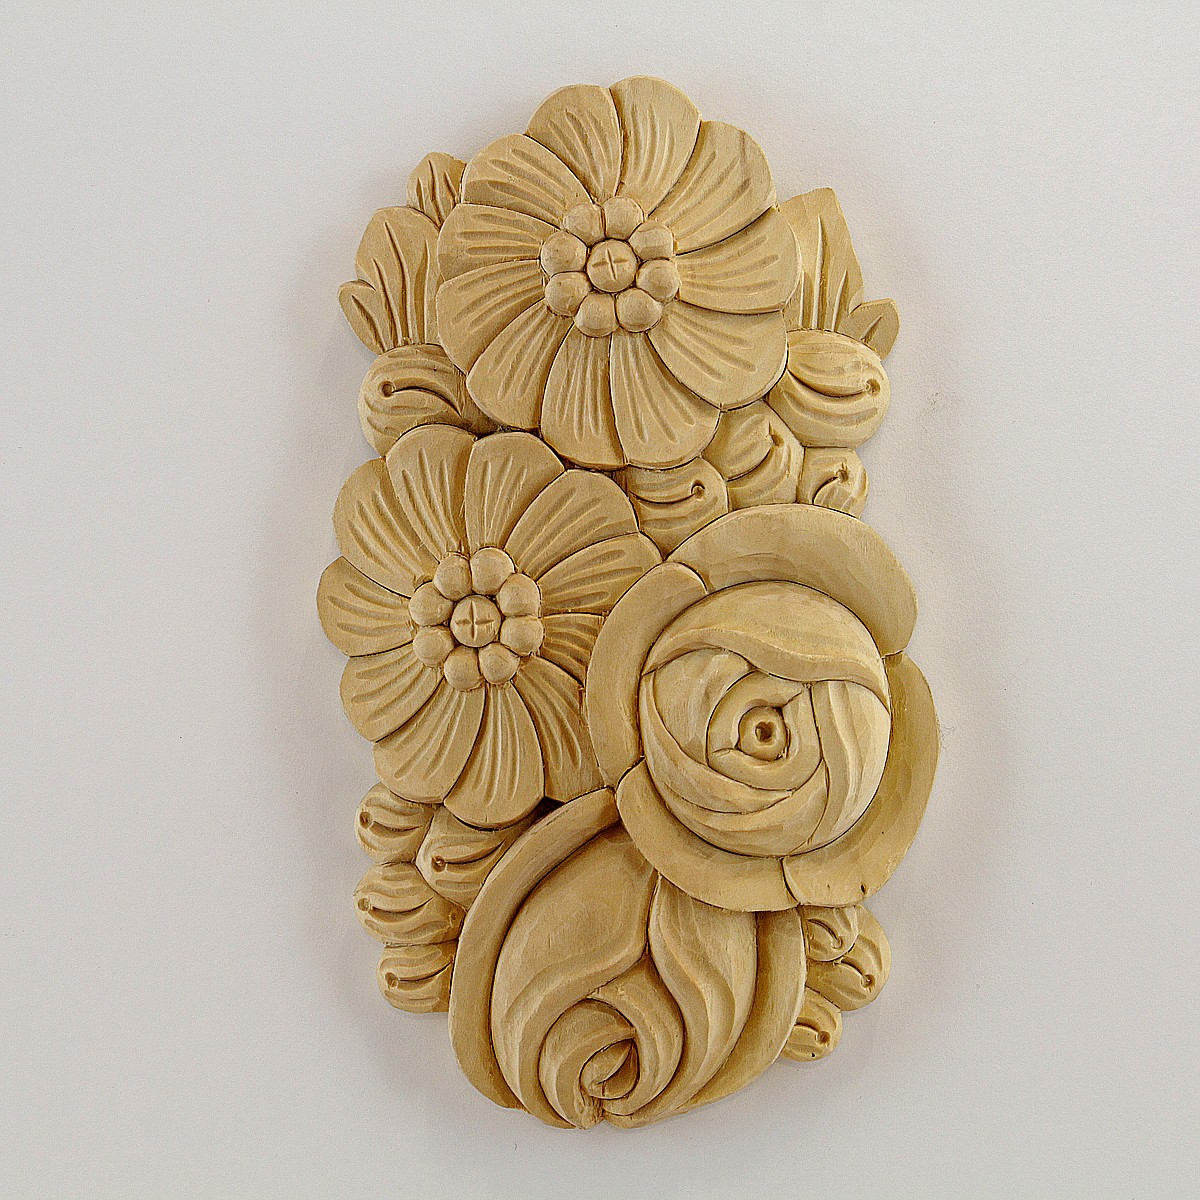 Flower relief albl oberammergau u2013 woodcarving studio